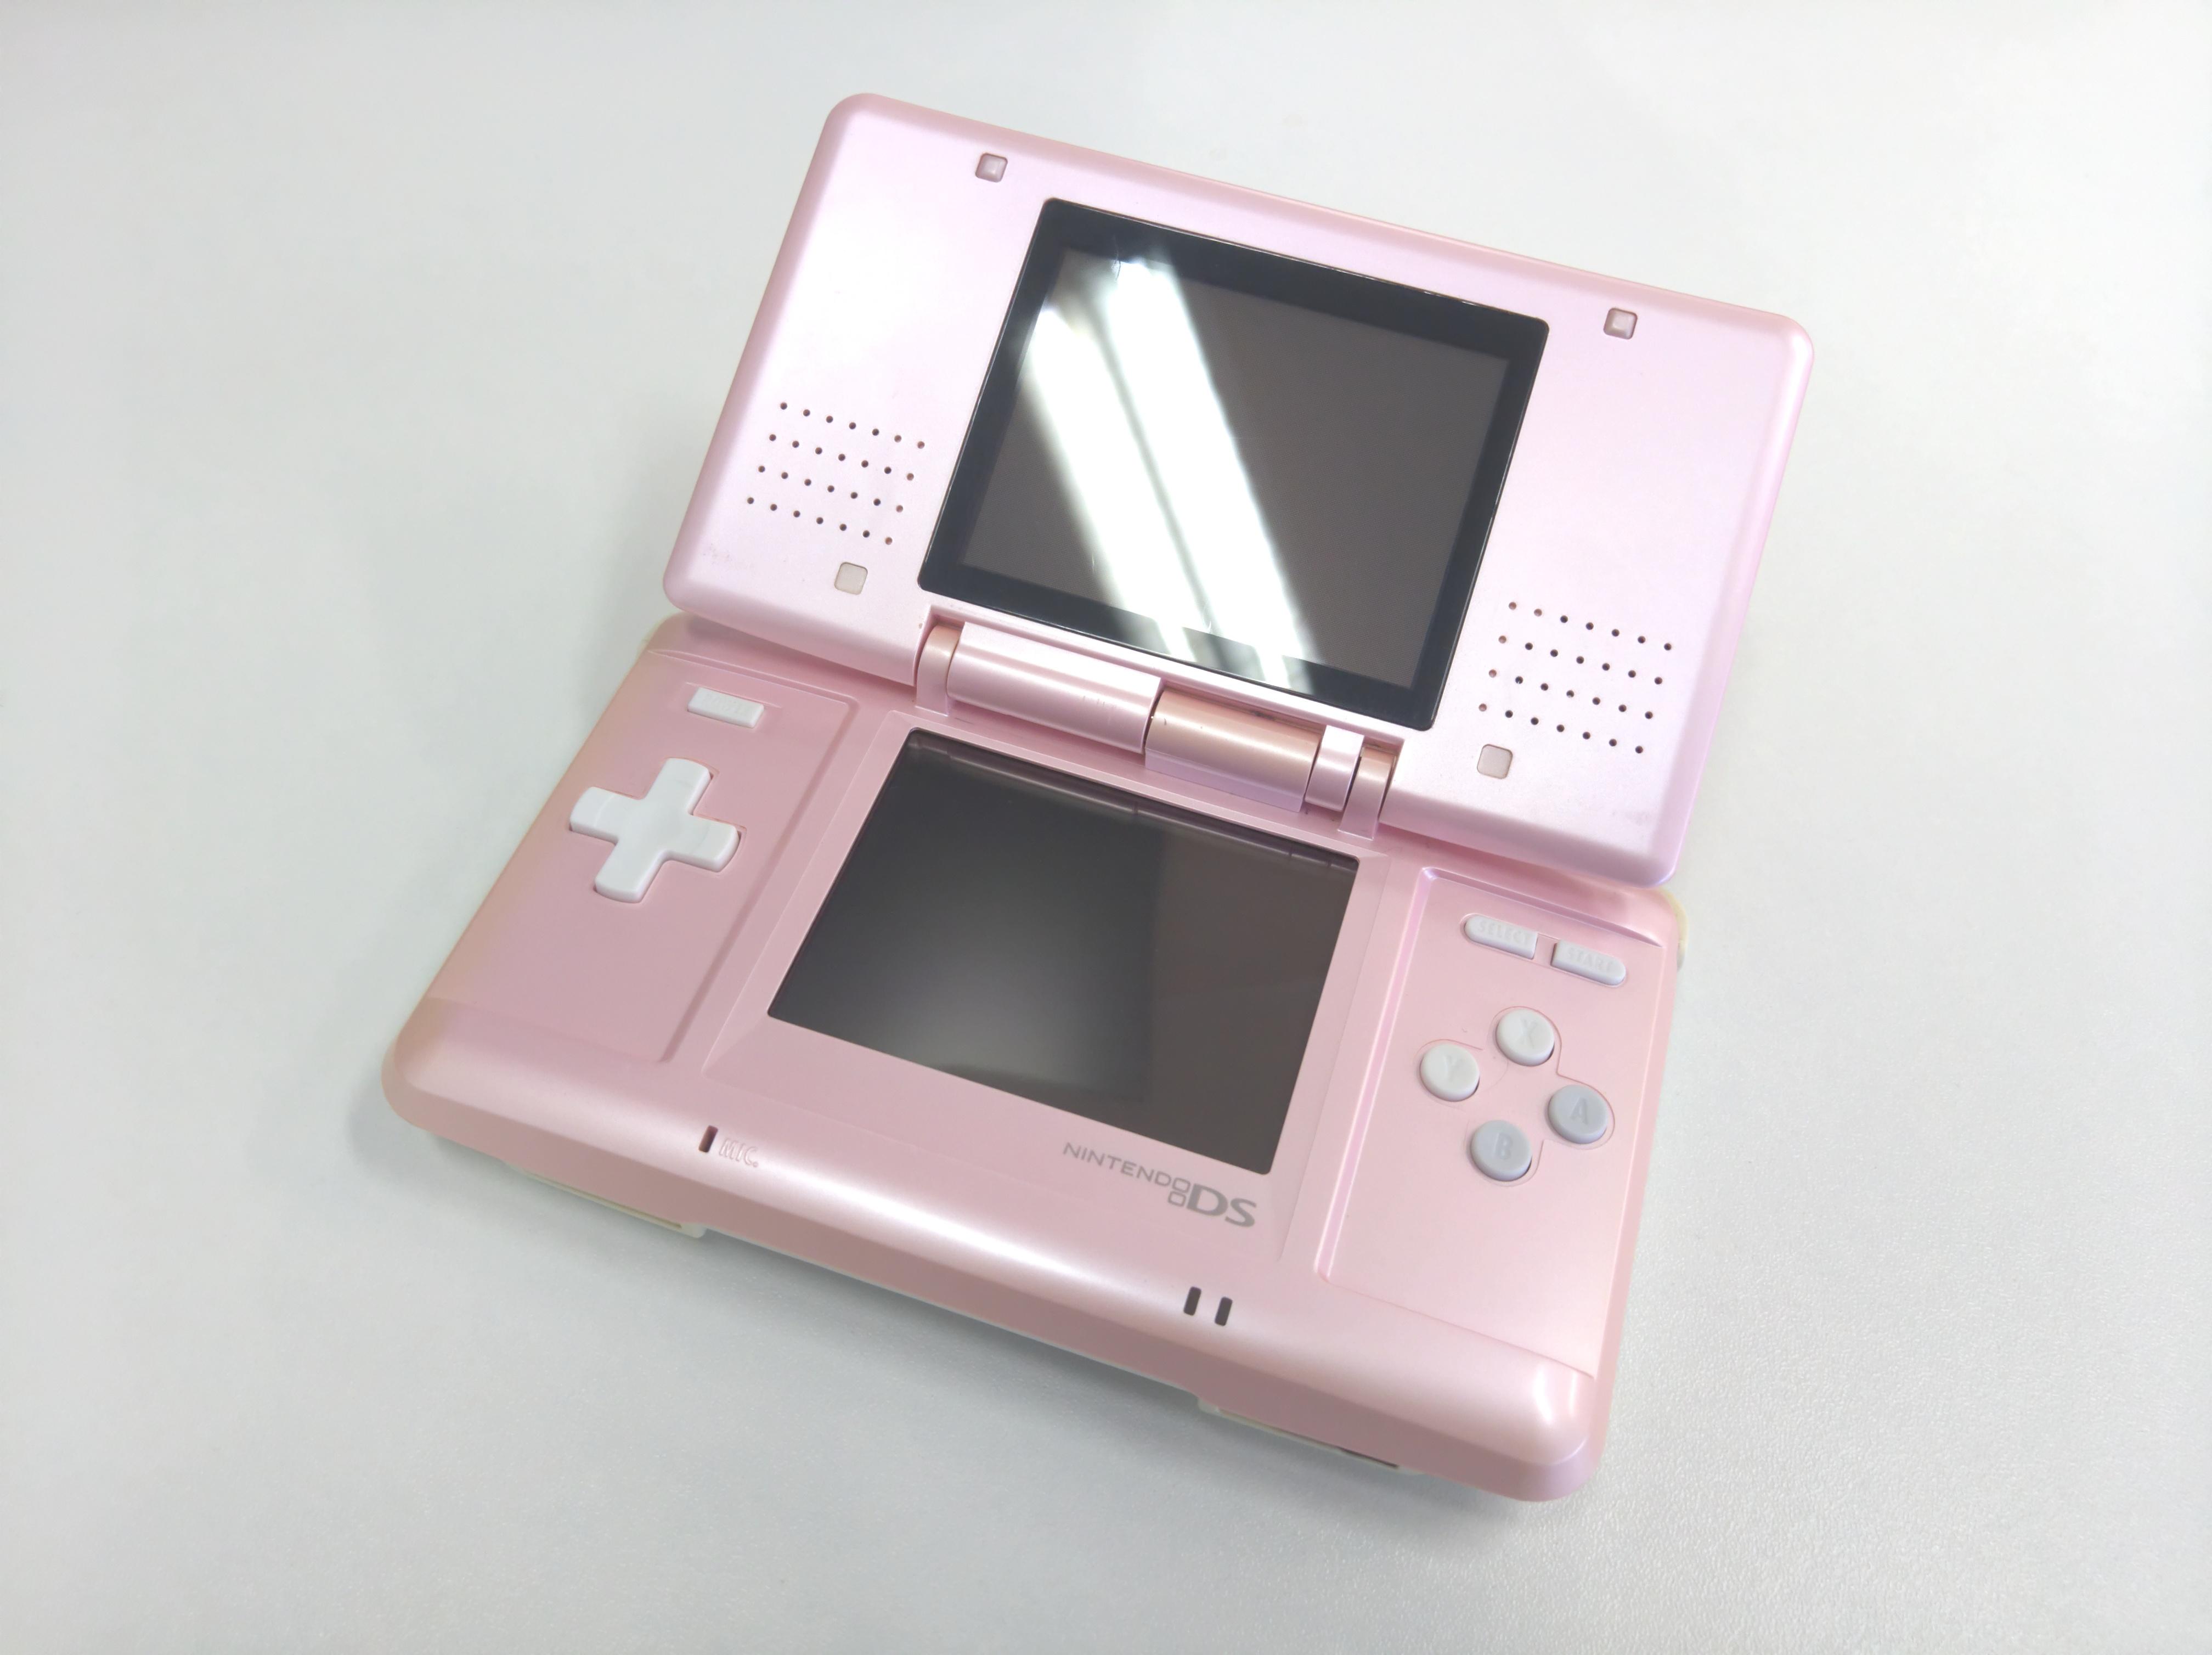 Nintendo DS - růžové (estetická vada)